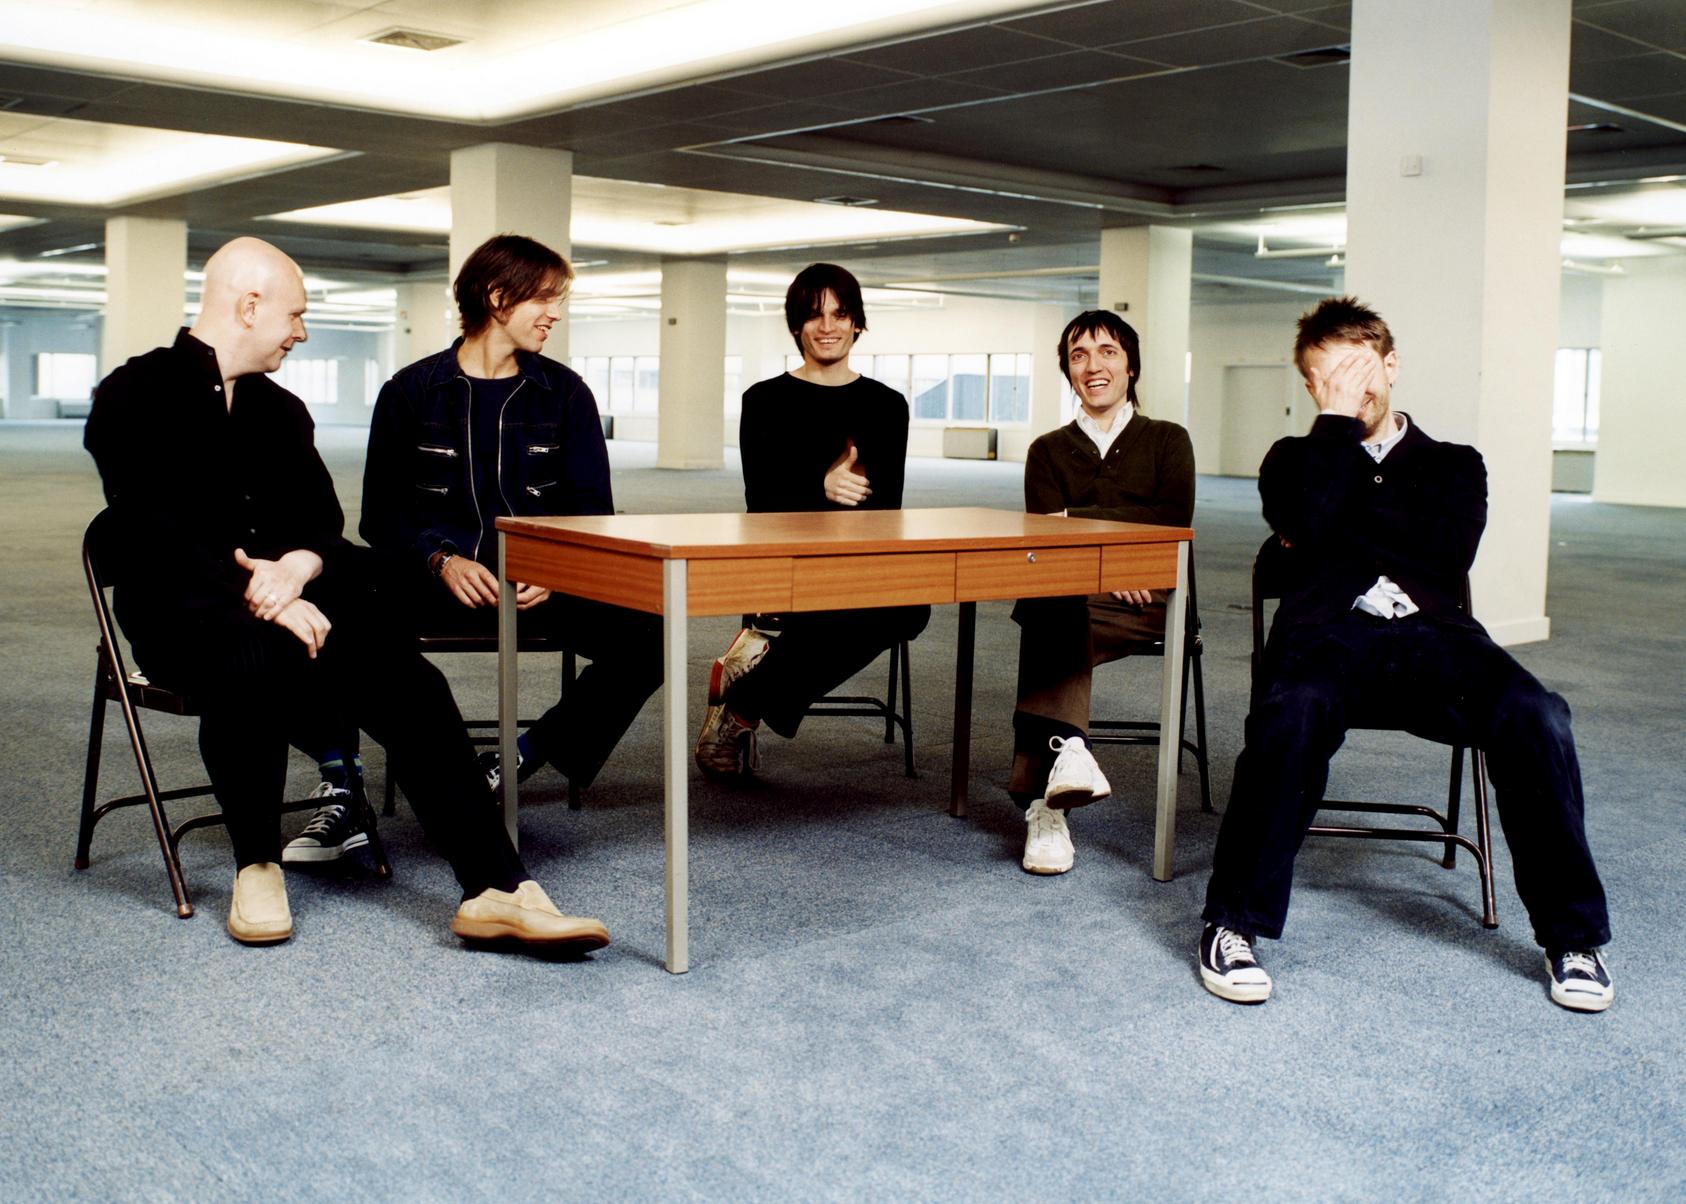 radiohead 2000